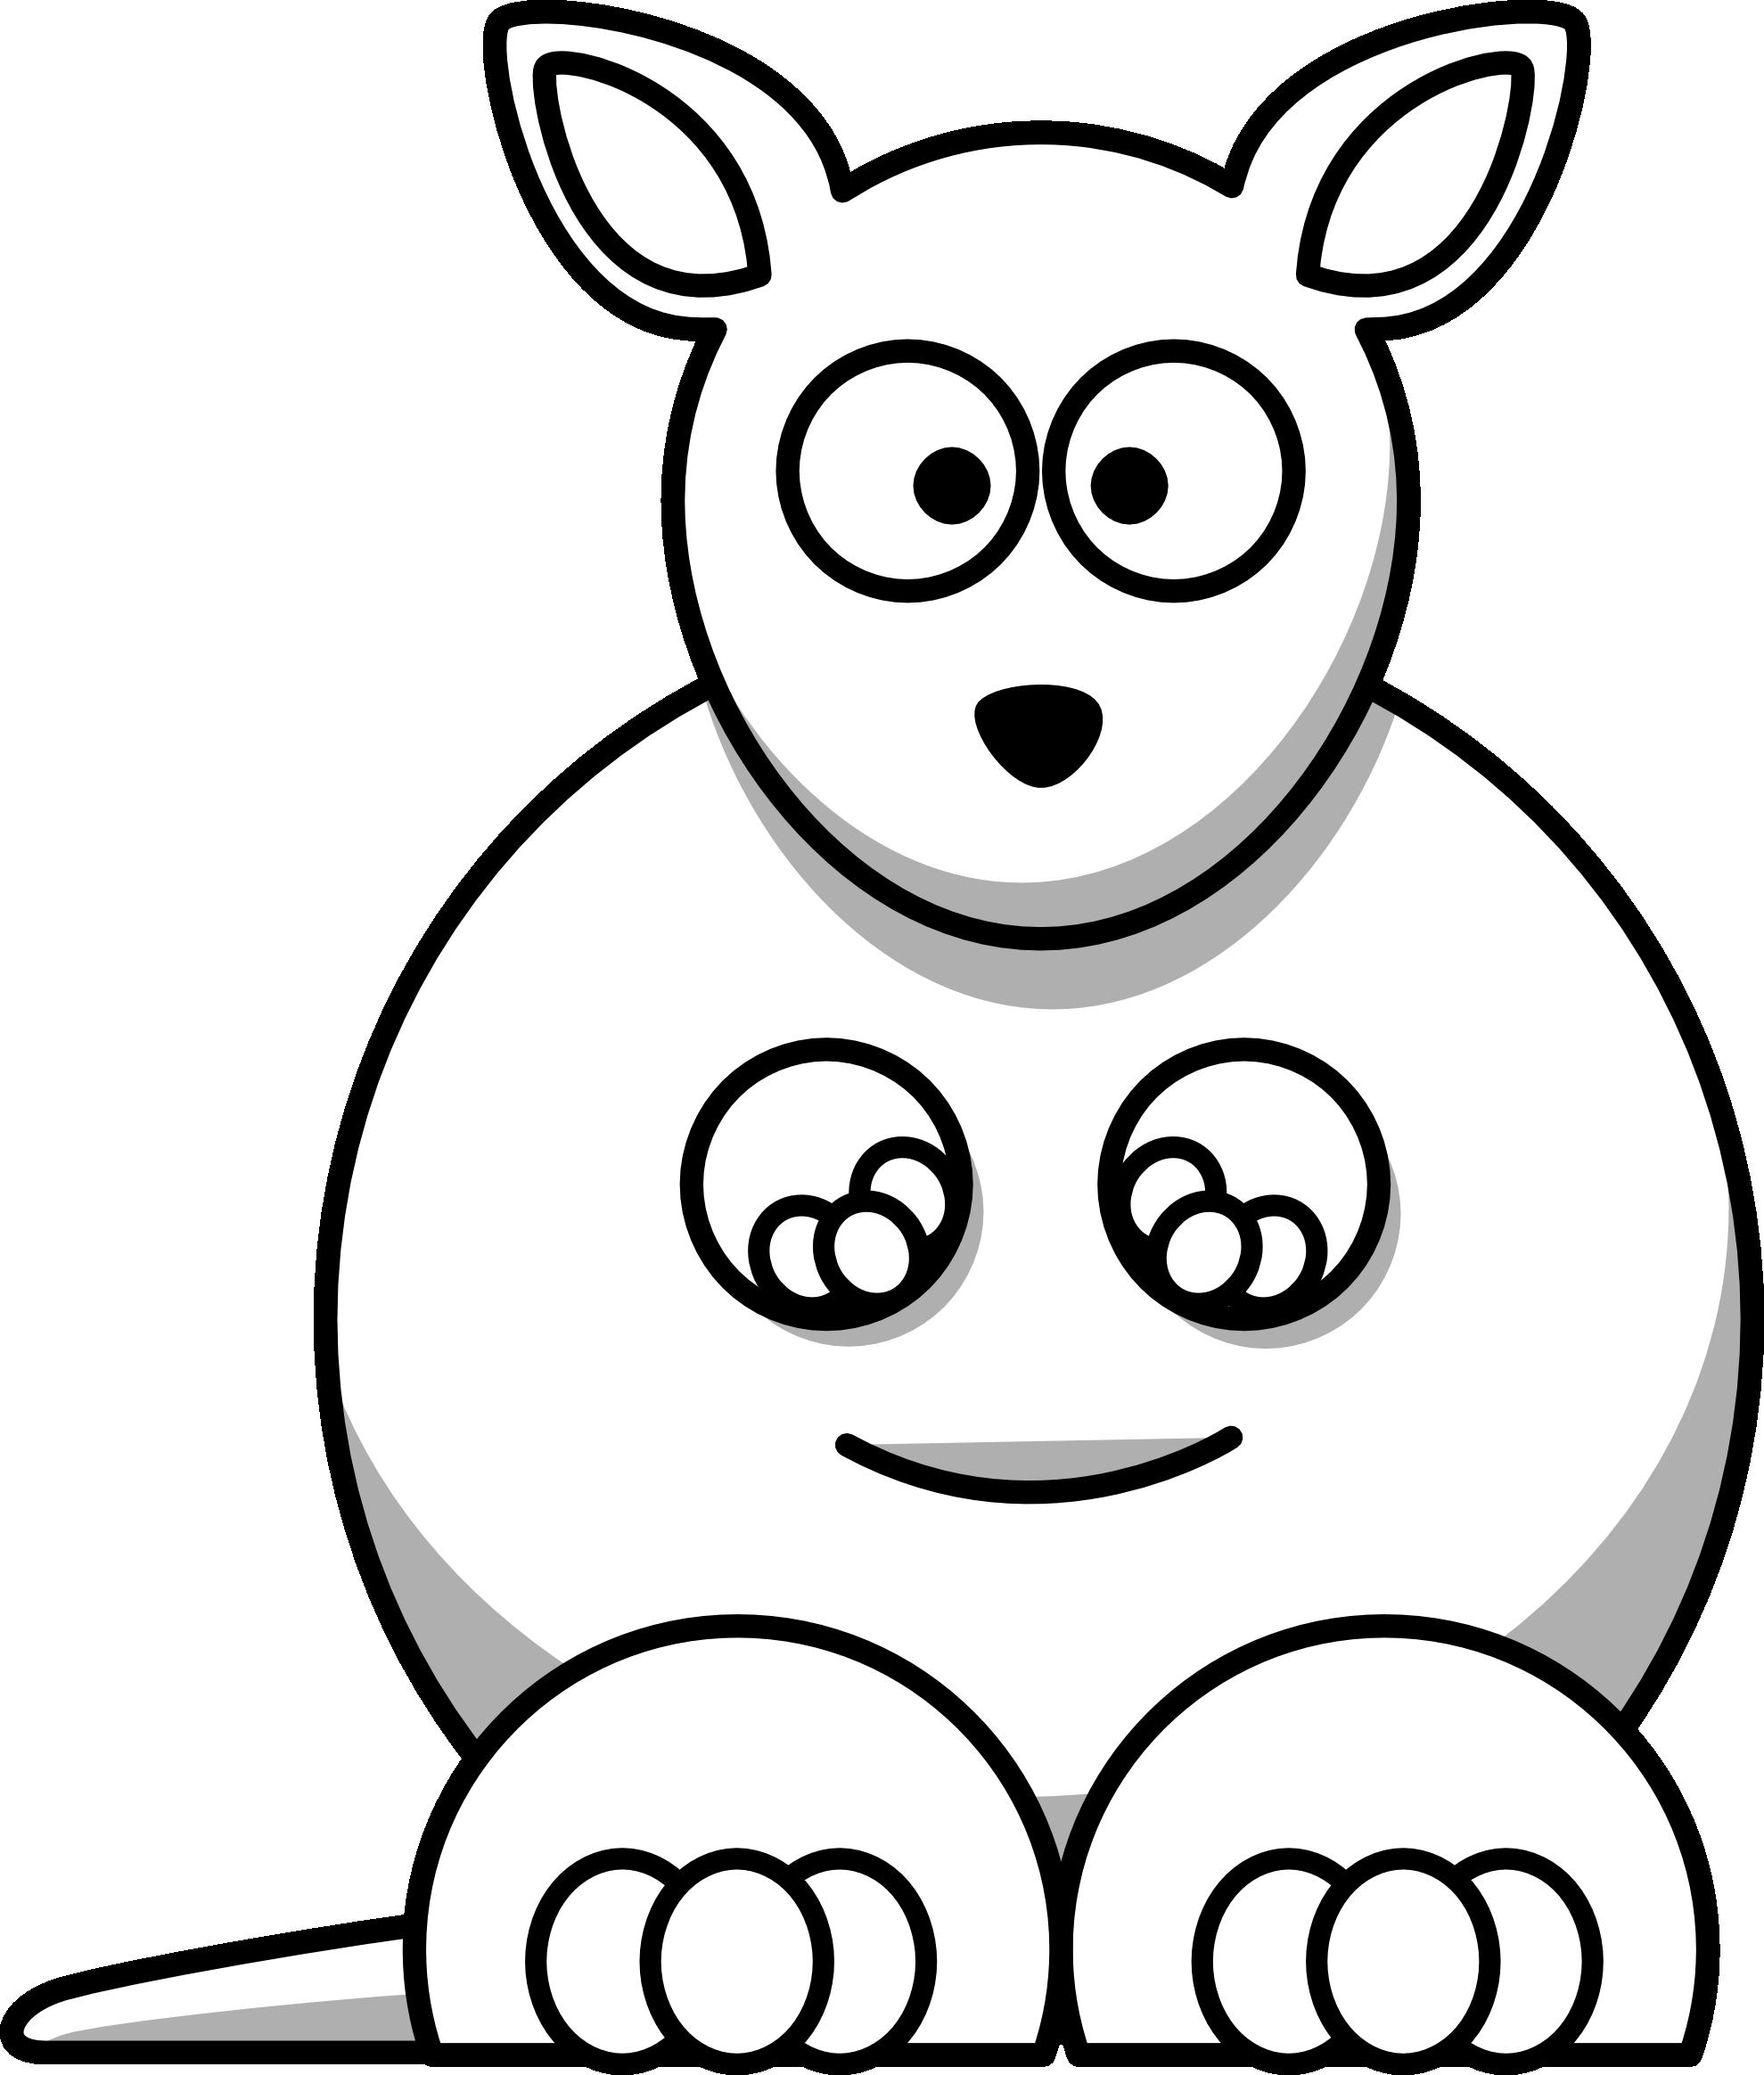 lemmling cartoon kangaroo black white line art ...